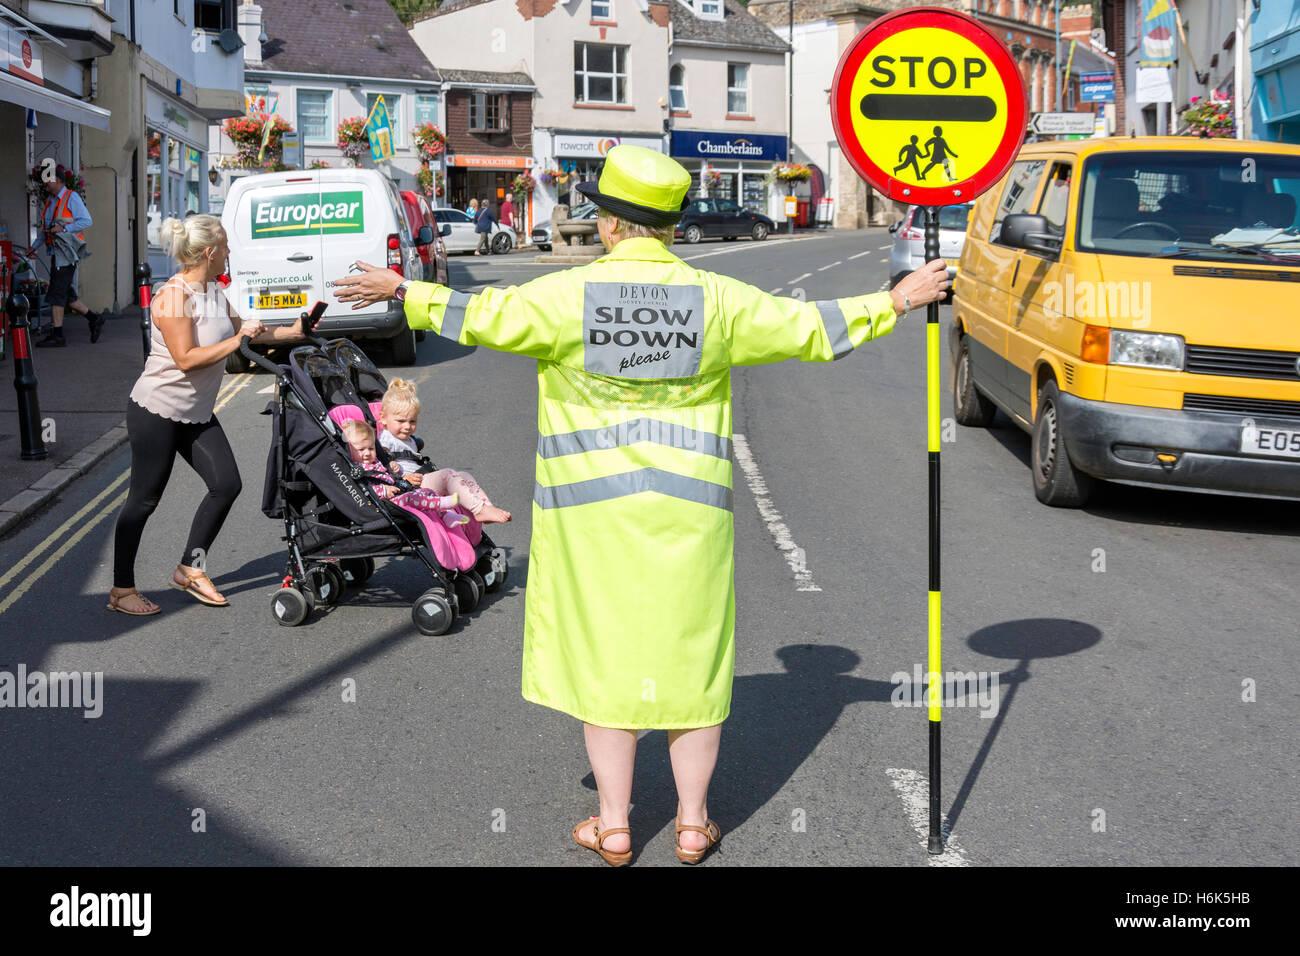 Lollipop-Dame (Schule Kreuzung Patrol Officer) stoppen Verkehr auf Vorderstraße, Bovey Tracey, Devon, England, Stockbild